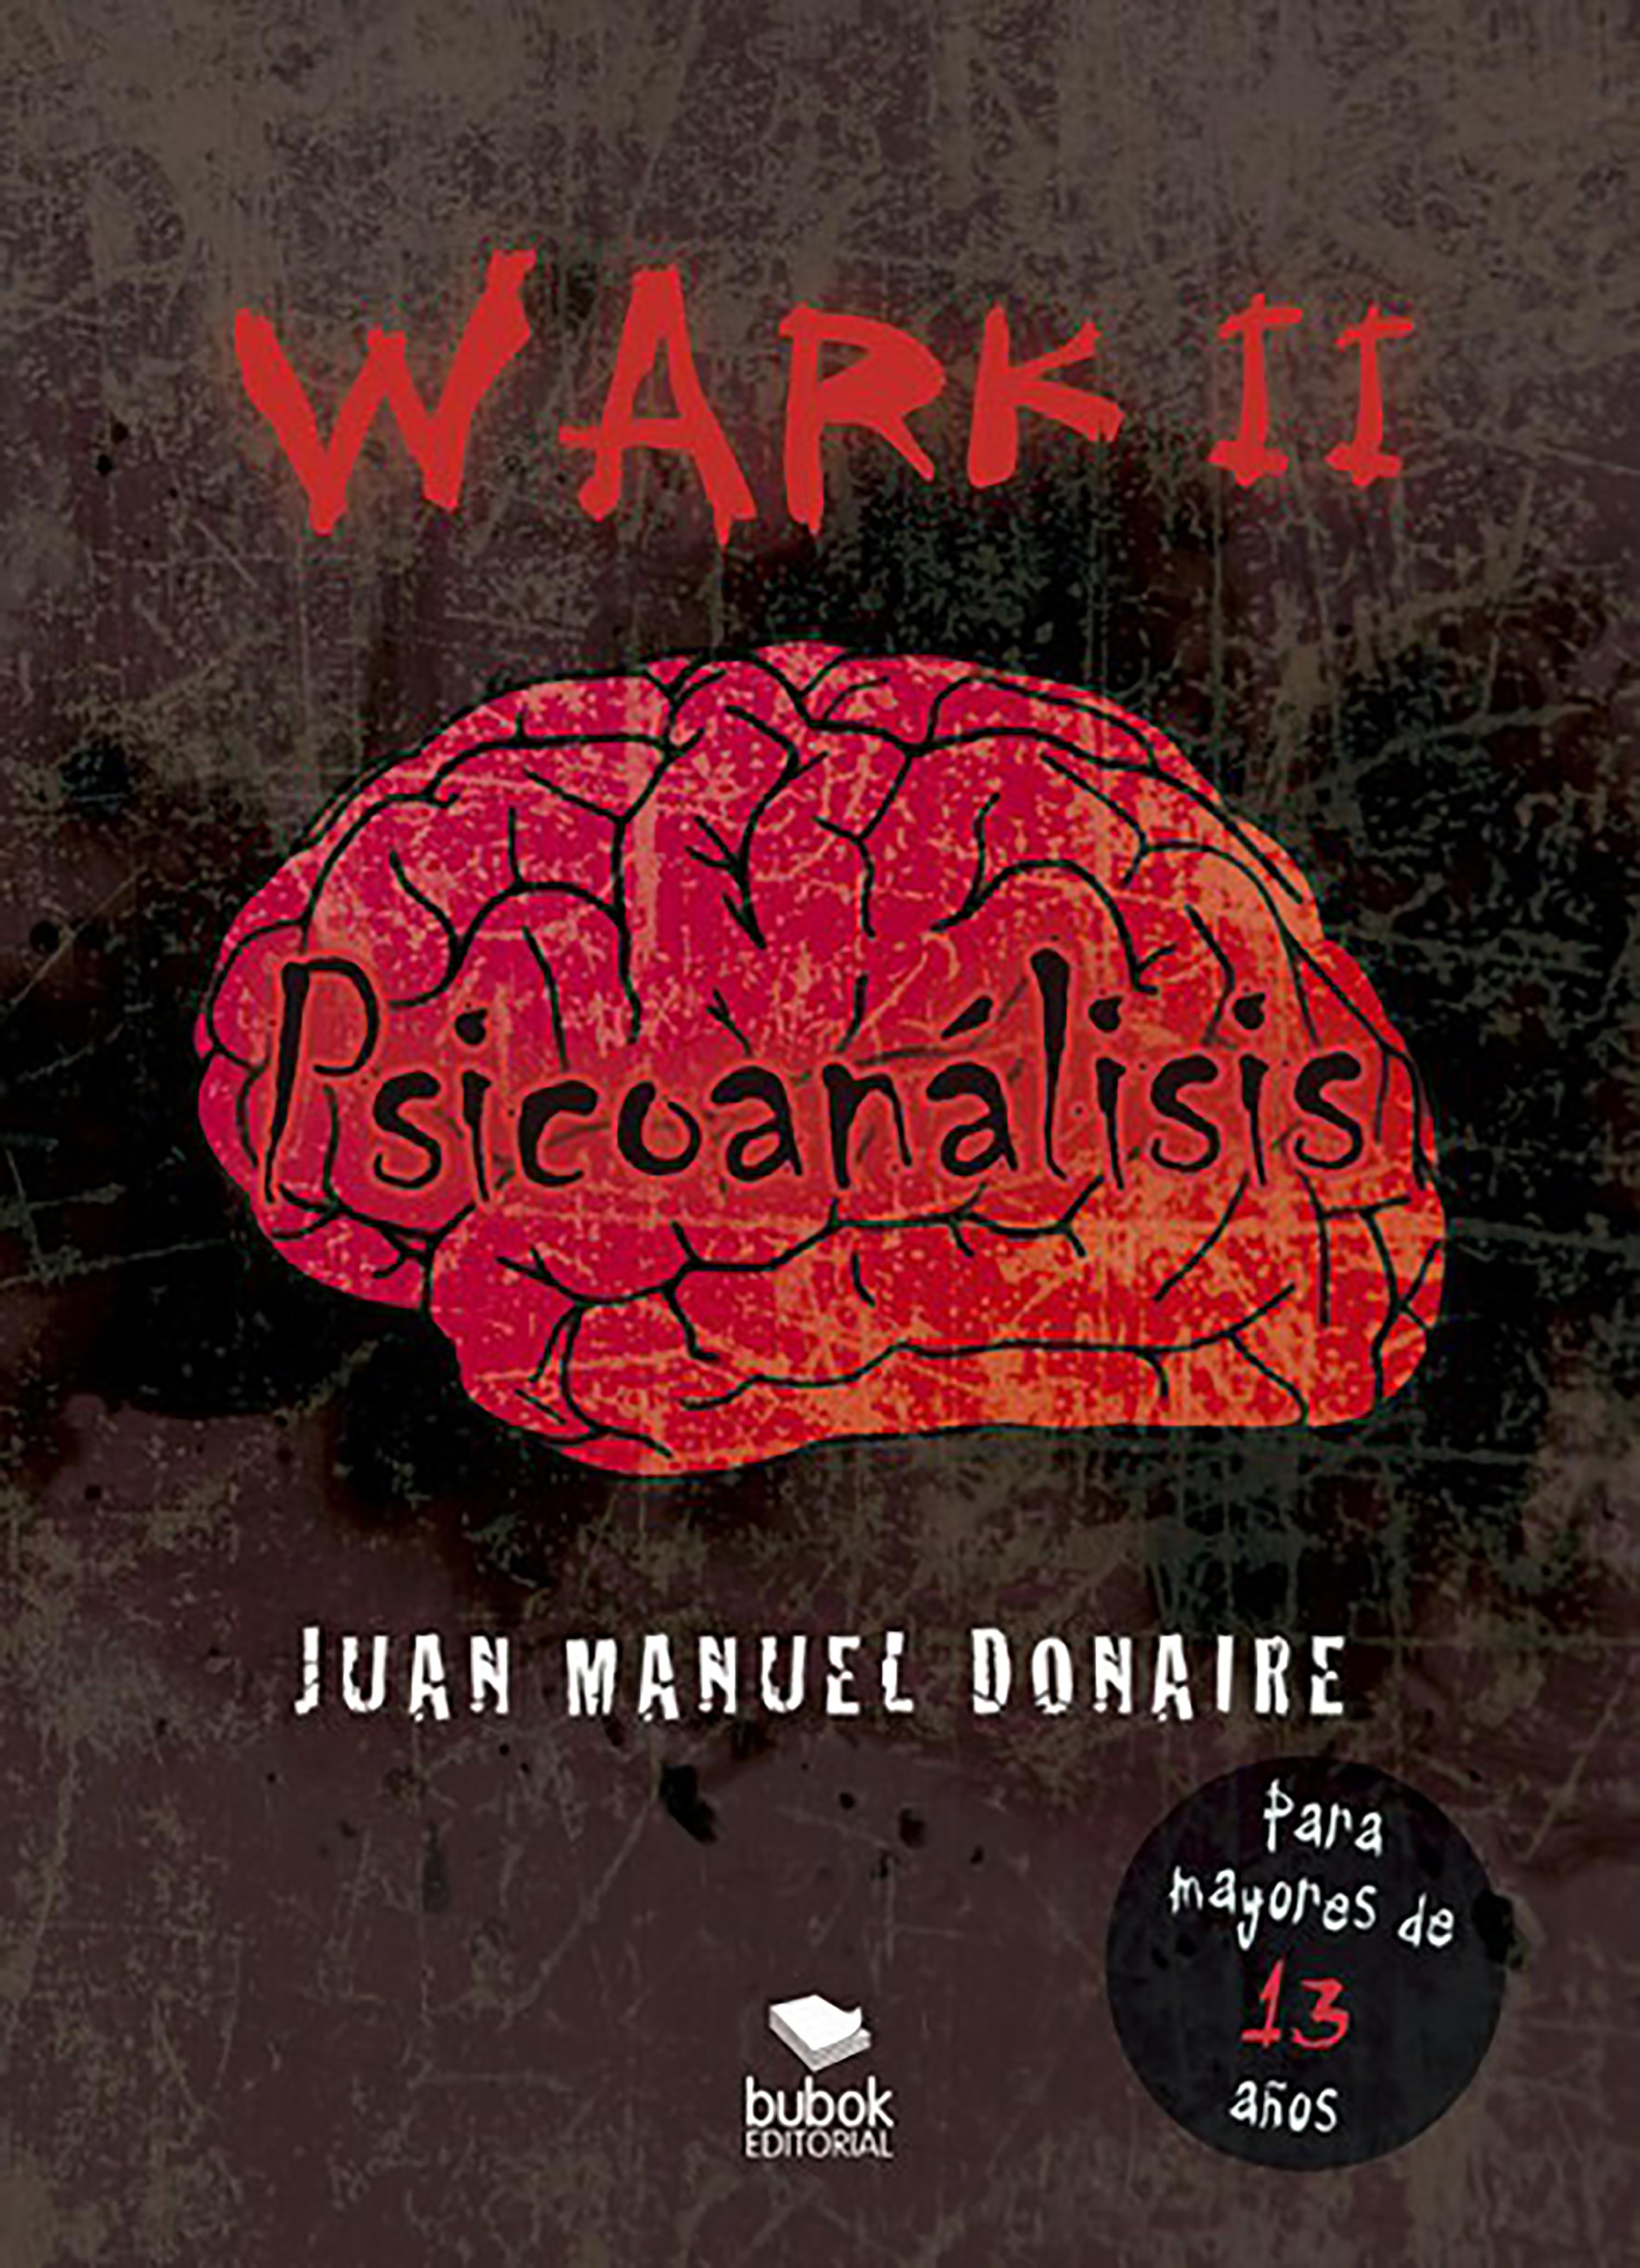 Juan Manuel Donaire Wark II juan manuel marcos gunteri talv